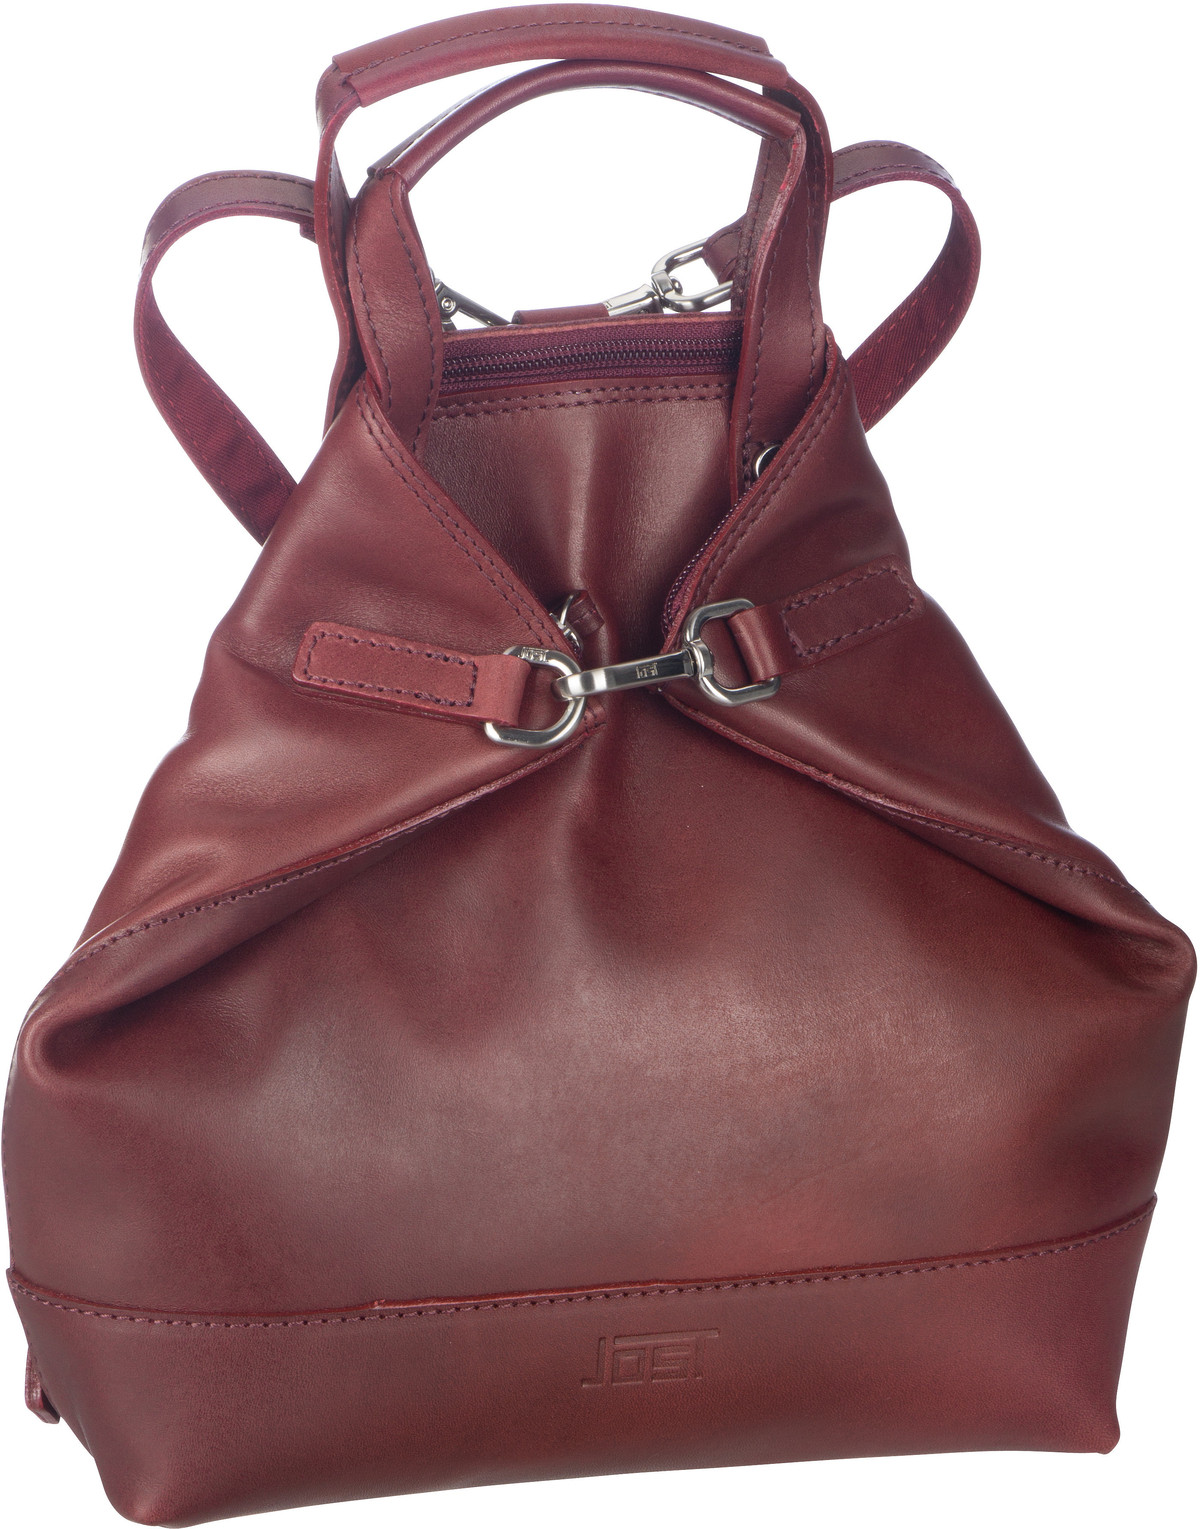 Rucksack / Daypack Rana 1276 X-Change Bag Mini Bordeaux